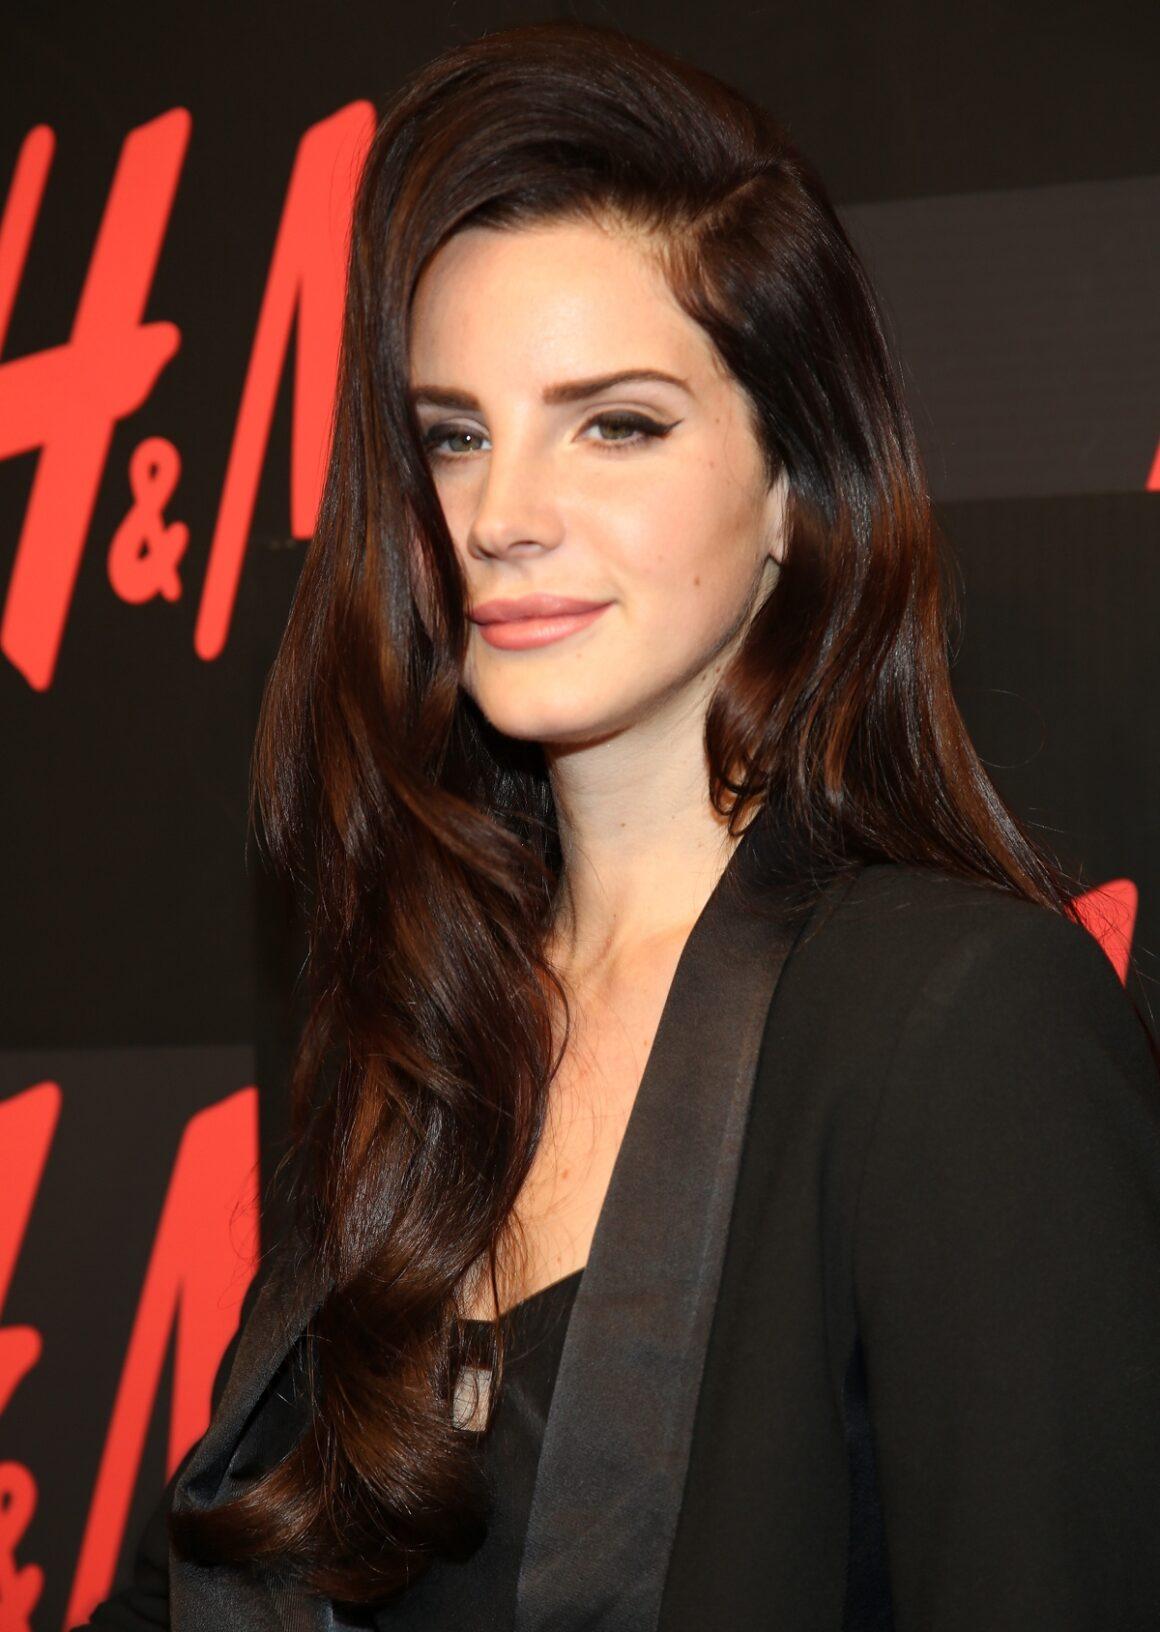 Lana Del Rey H&M Hosts Private Concert With Lana Del Rey - Arrivals